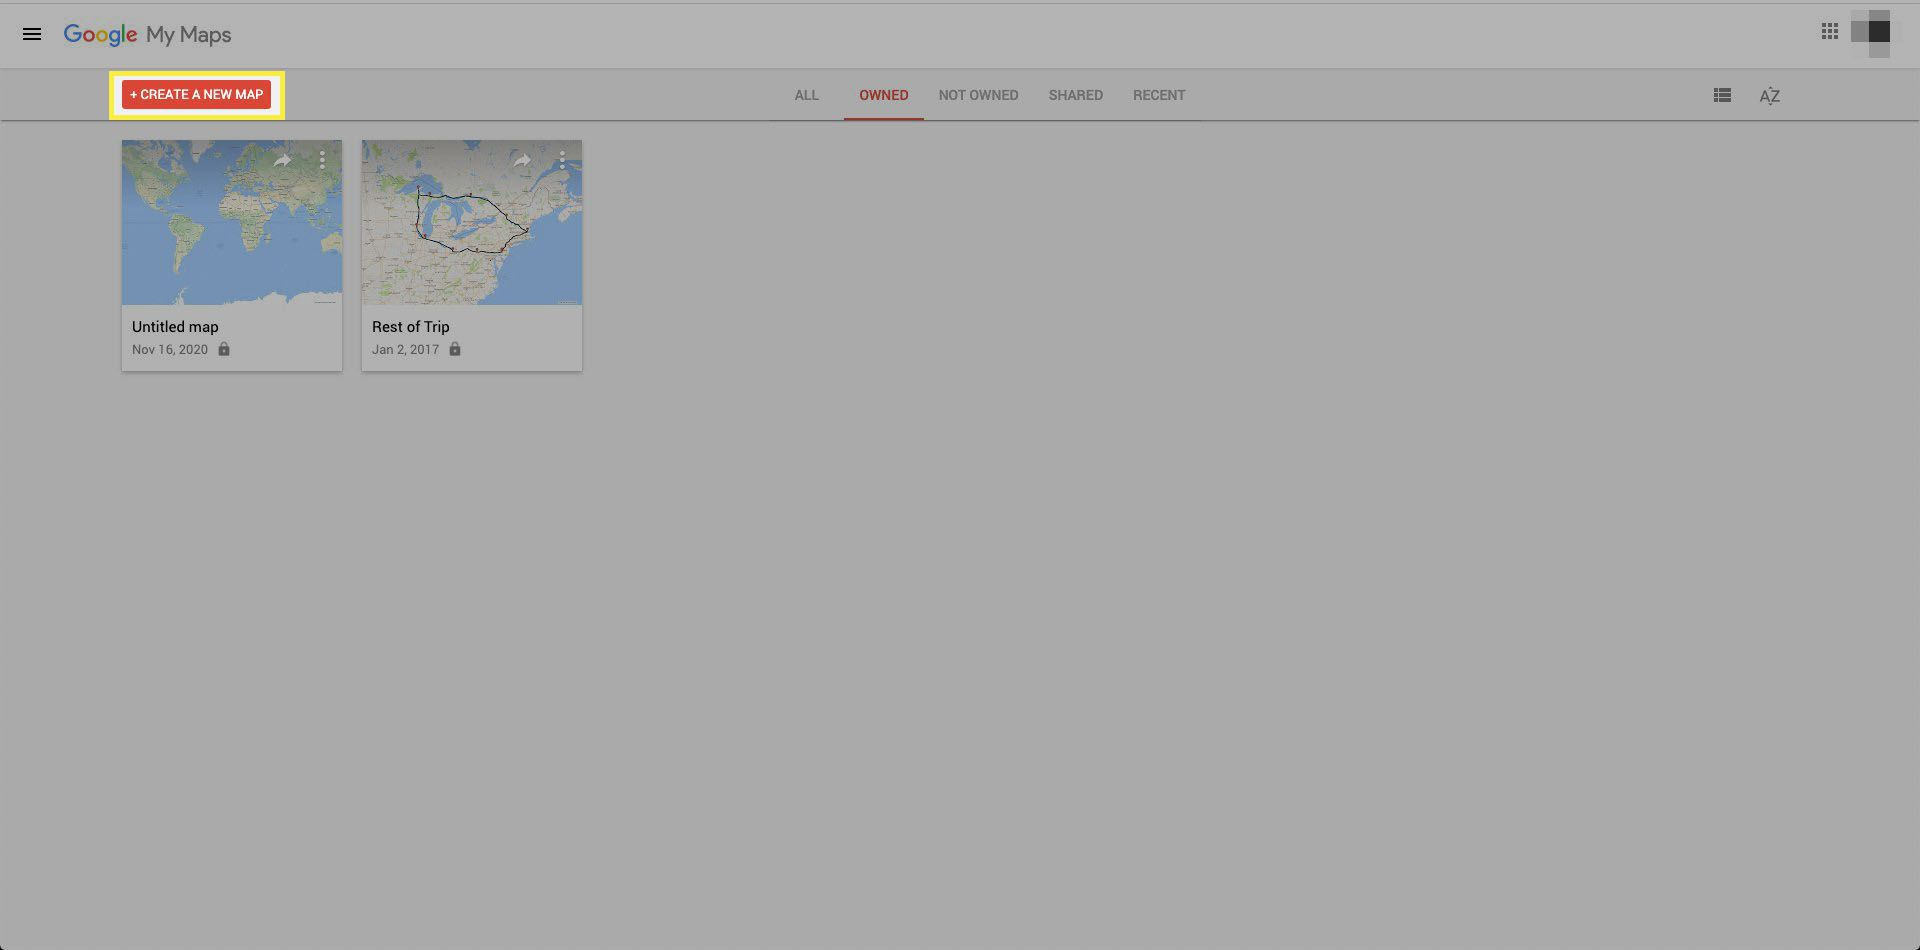 Google My Maps create new map